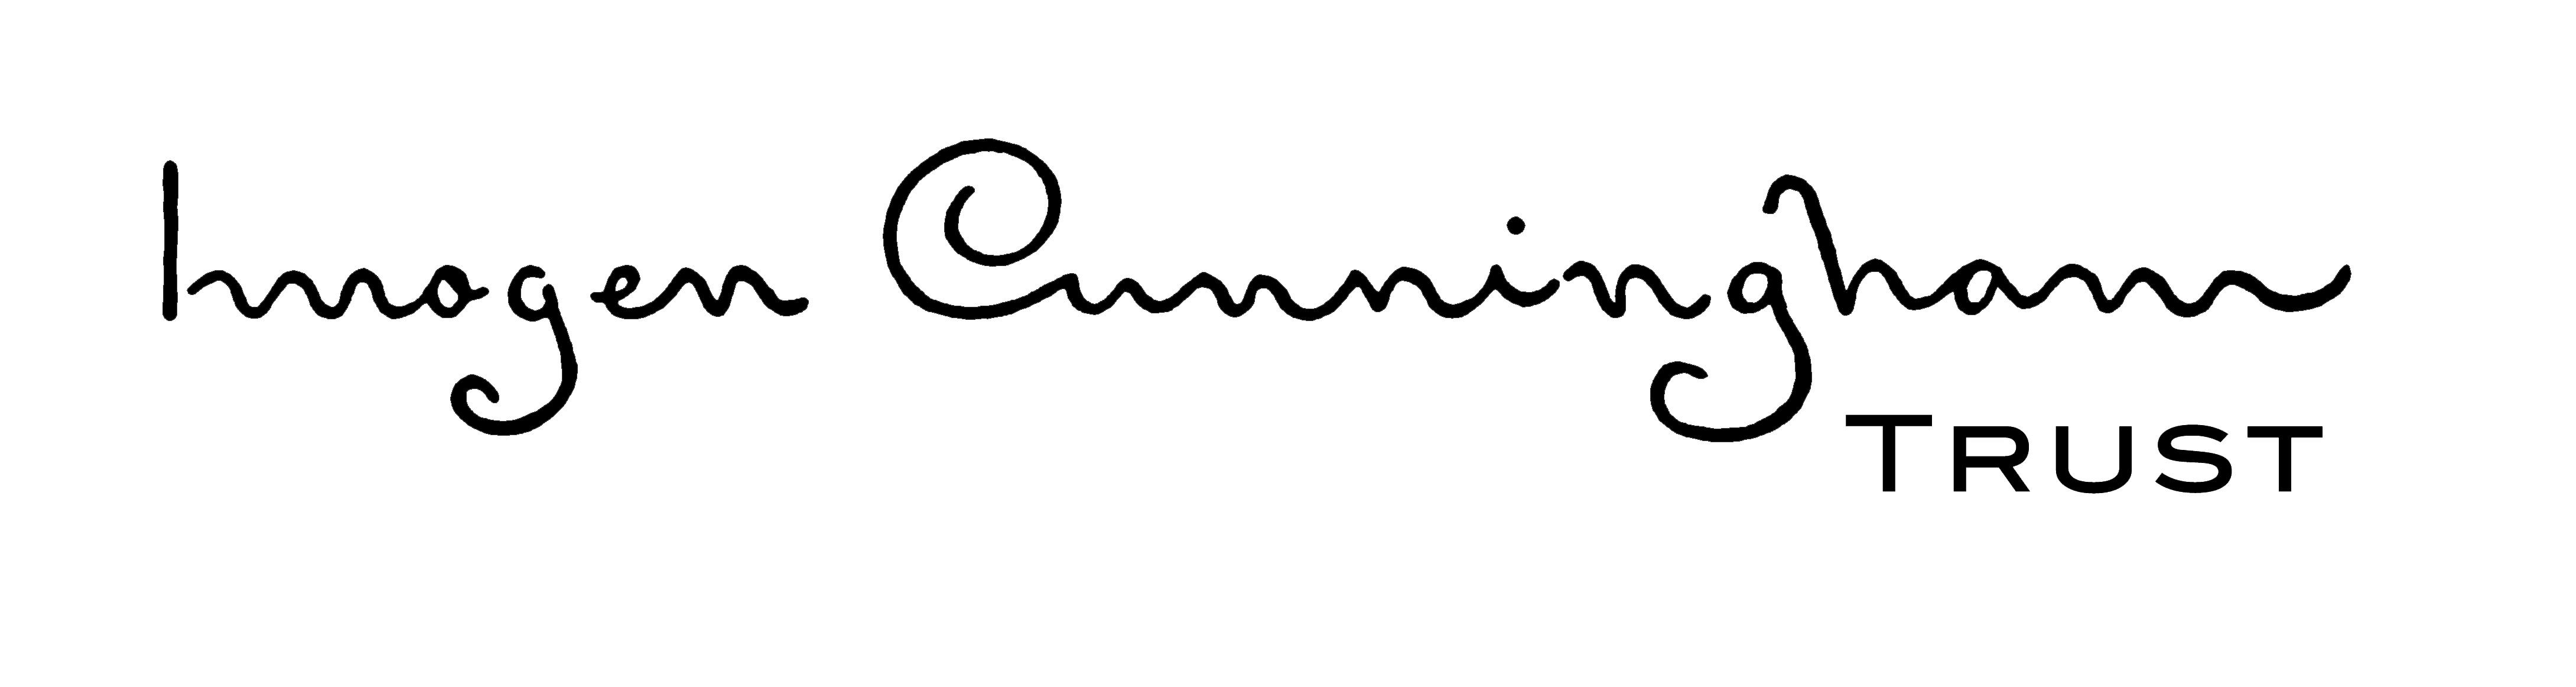 Imogen Cunningham Trust company logo